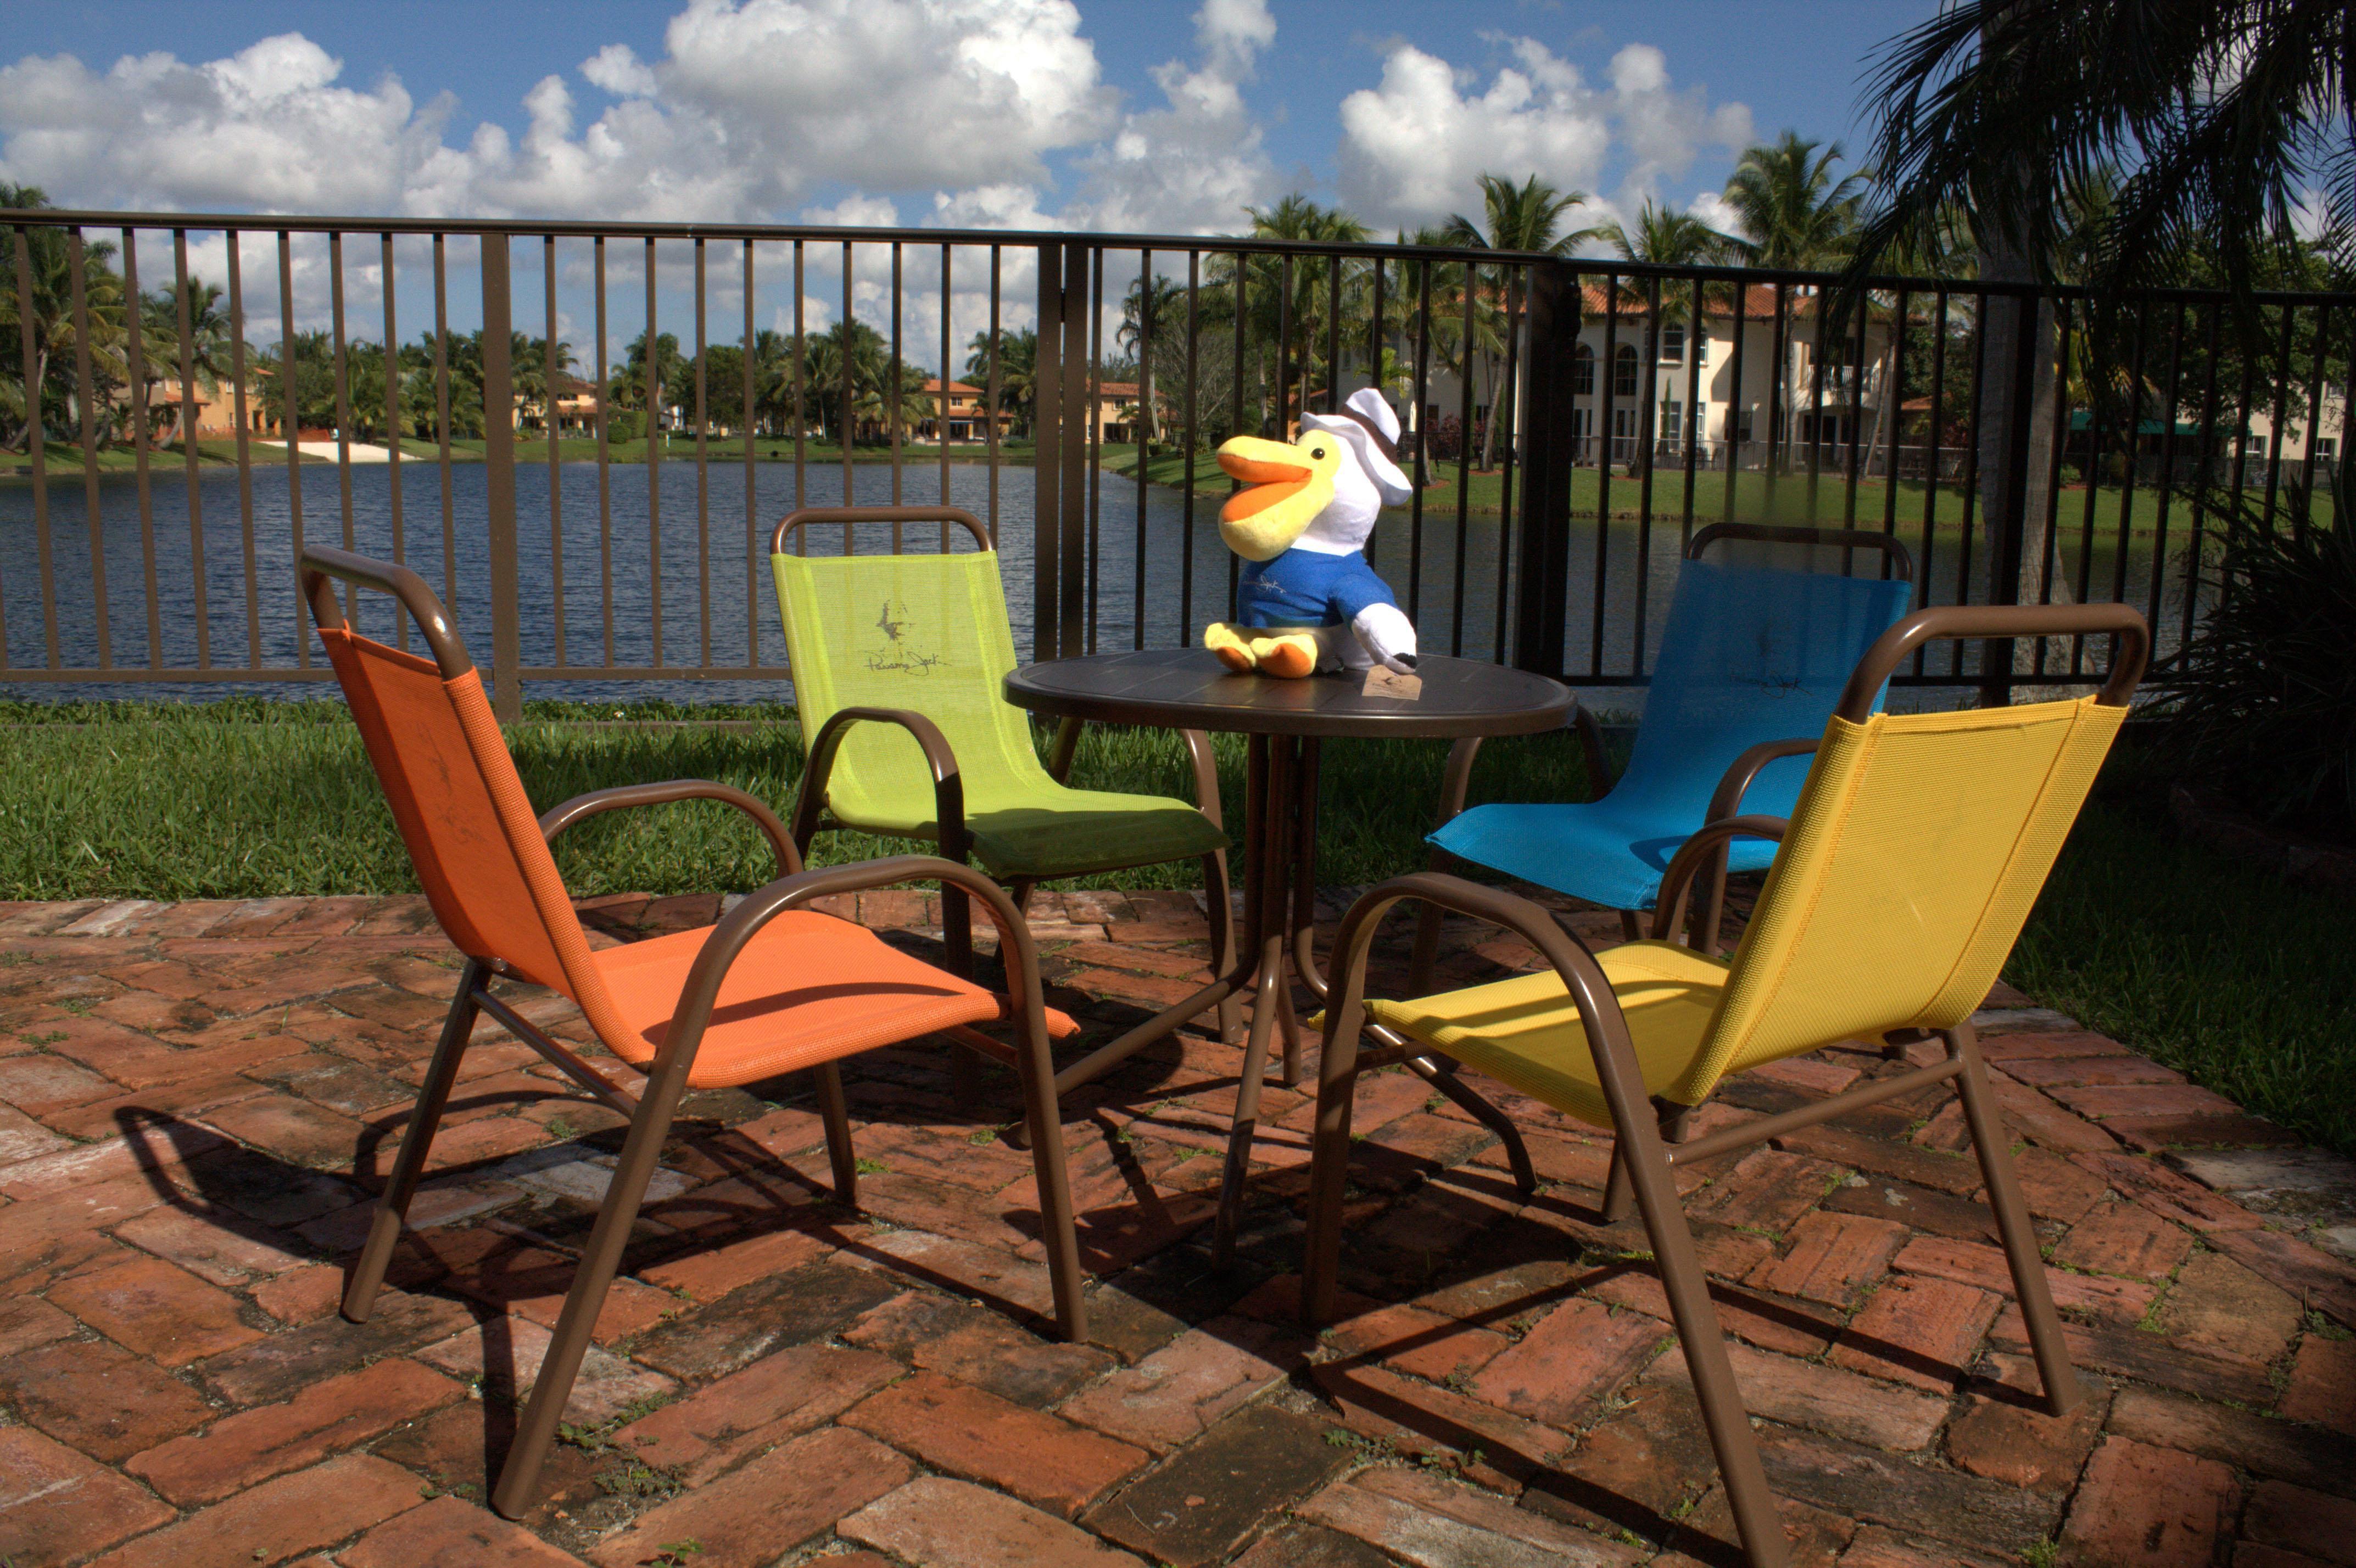 Panama Jack Kids 5 Piece Outdoor Dining Set Multicolored